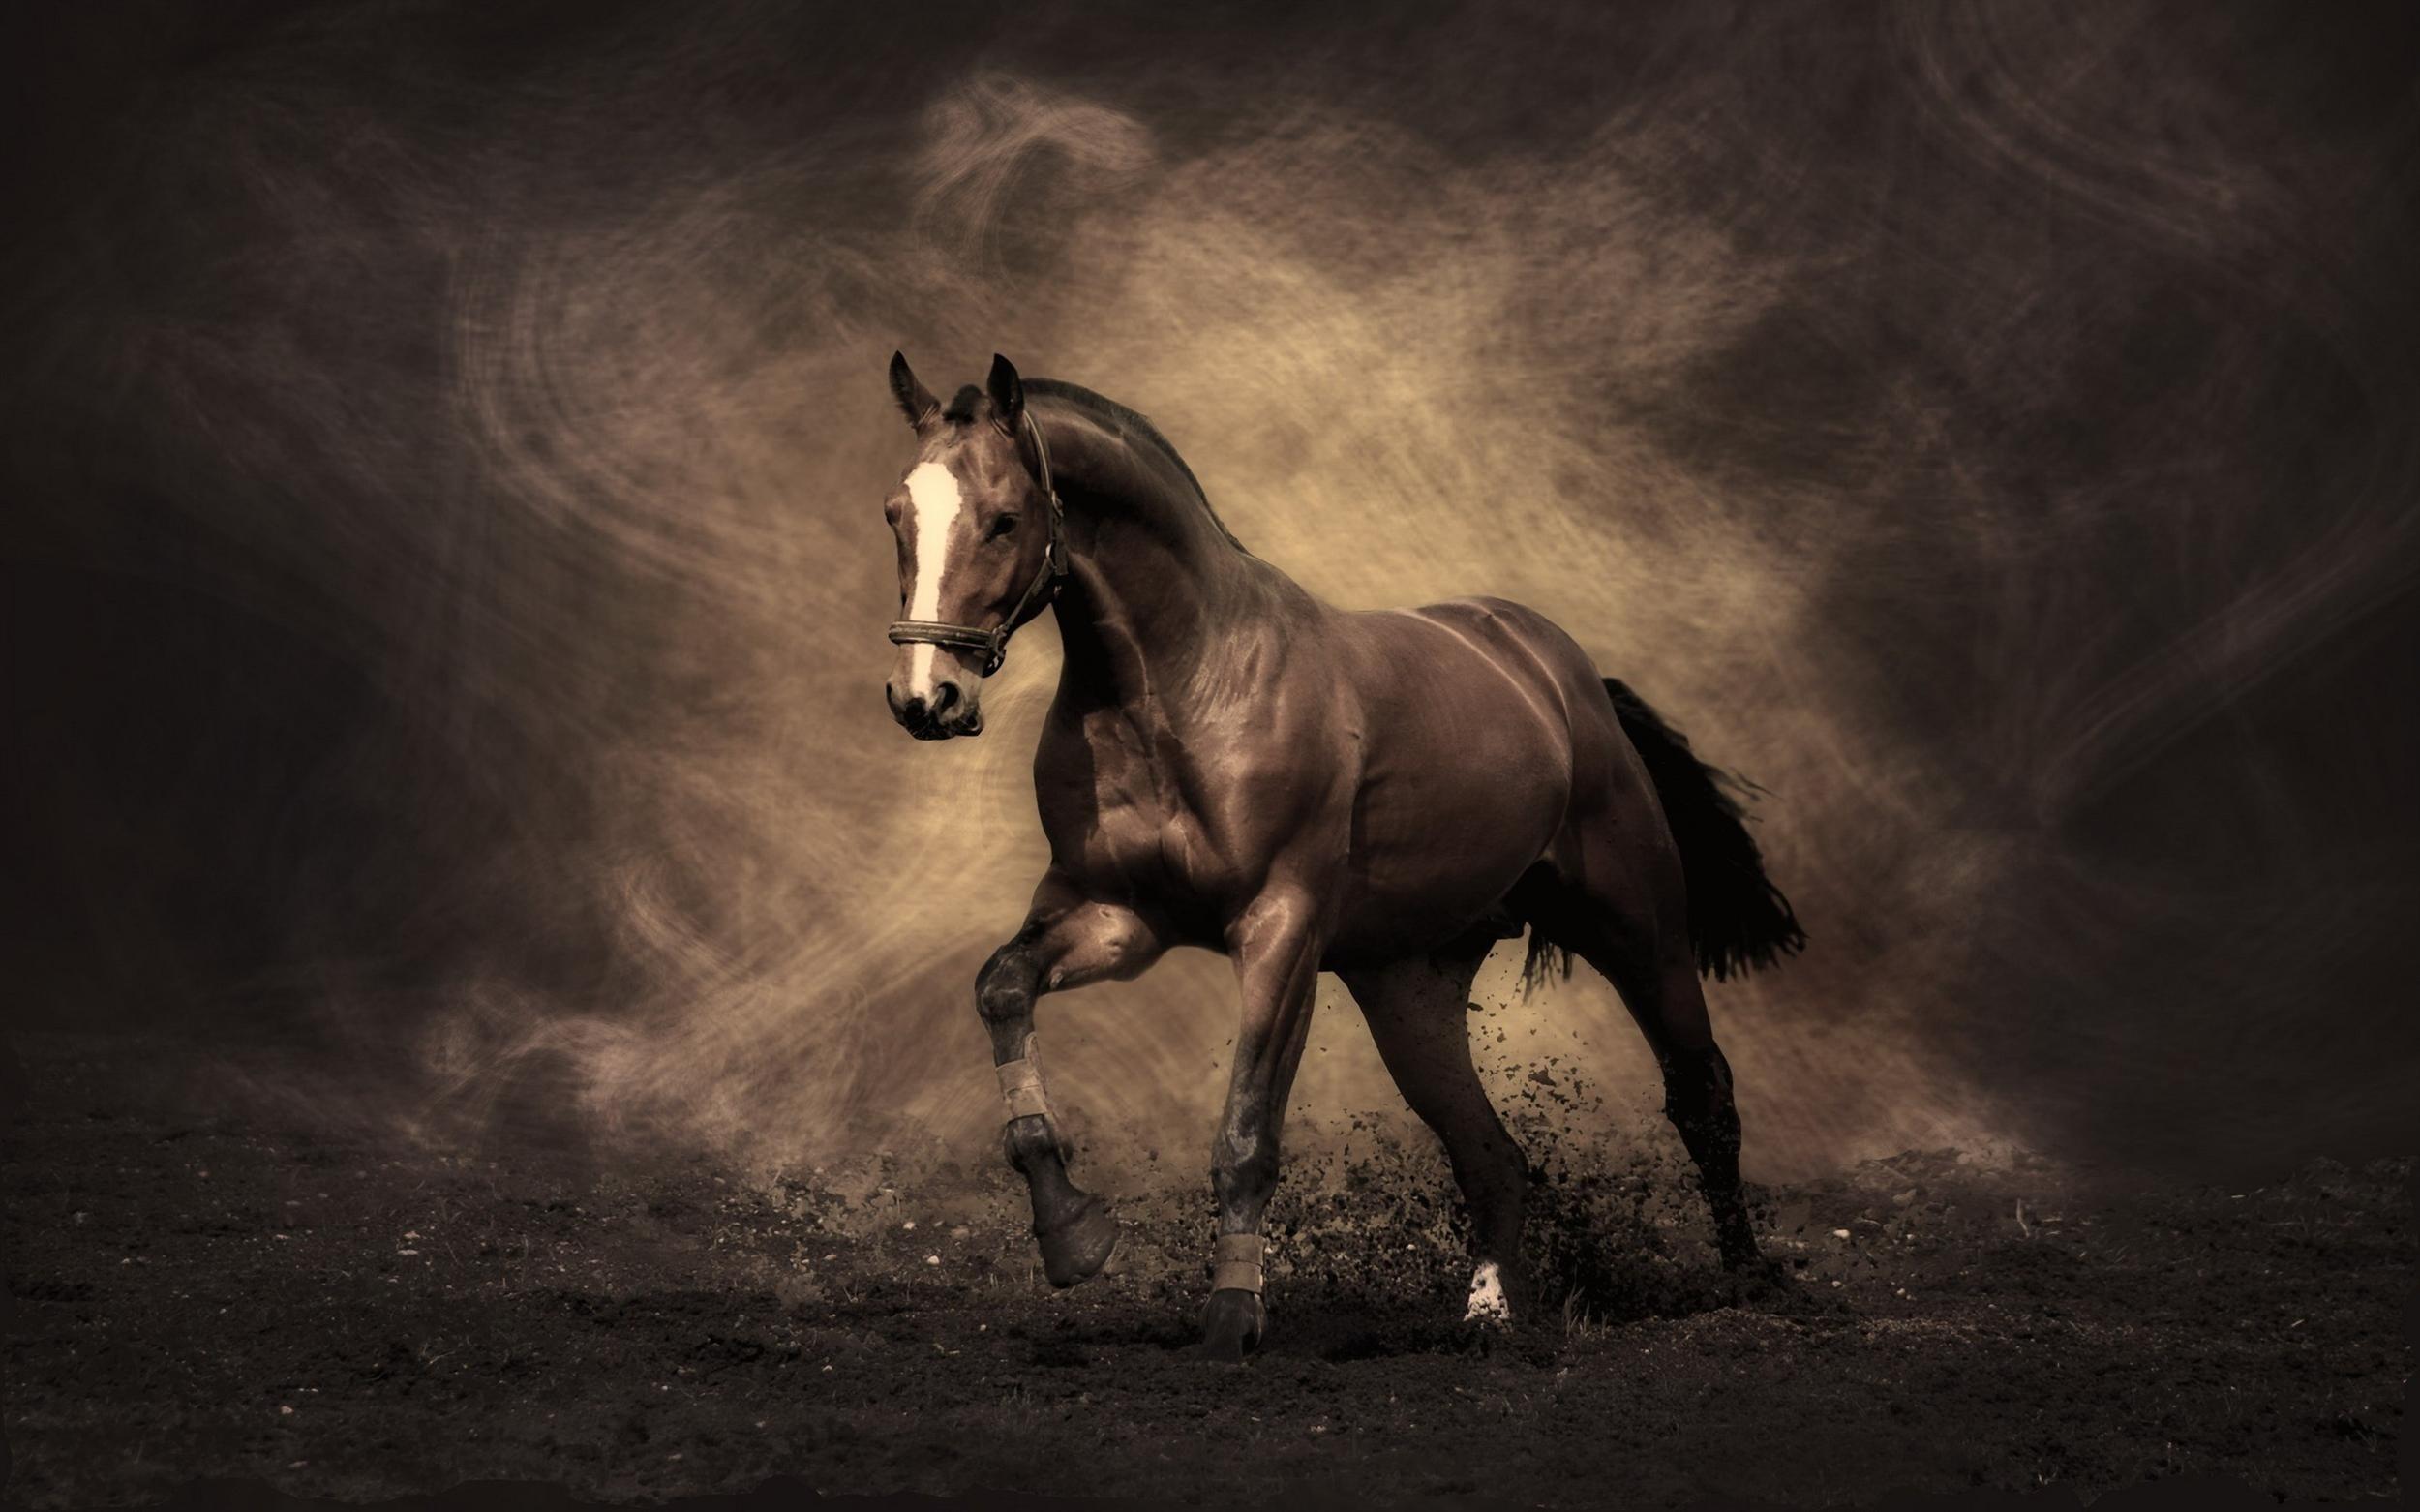 HD Wallpapers | HD Wallpaper Sephia Horse Colour | HD Gallery